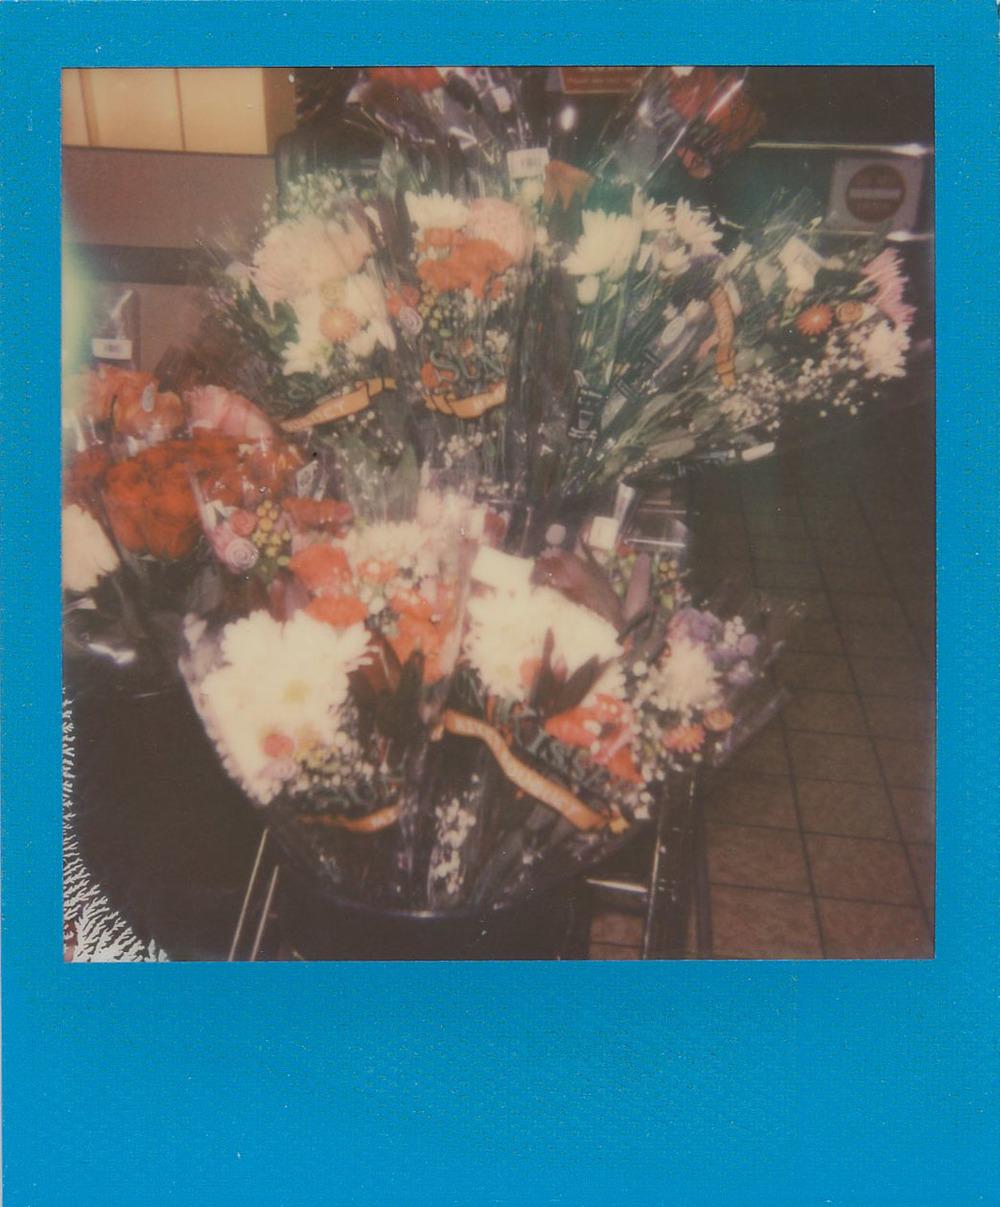 aldi_flower_display.jpg